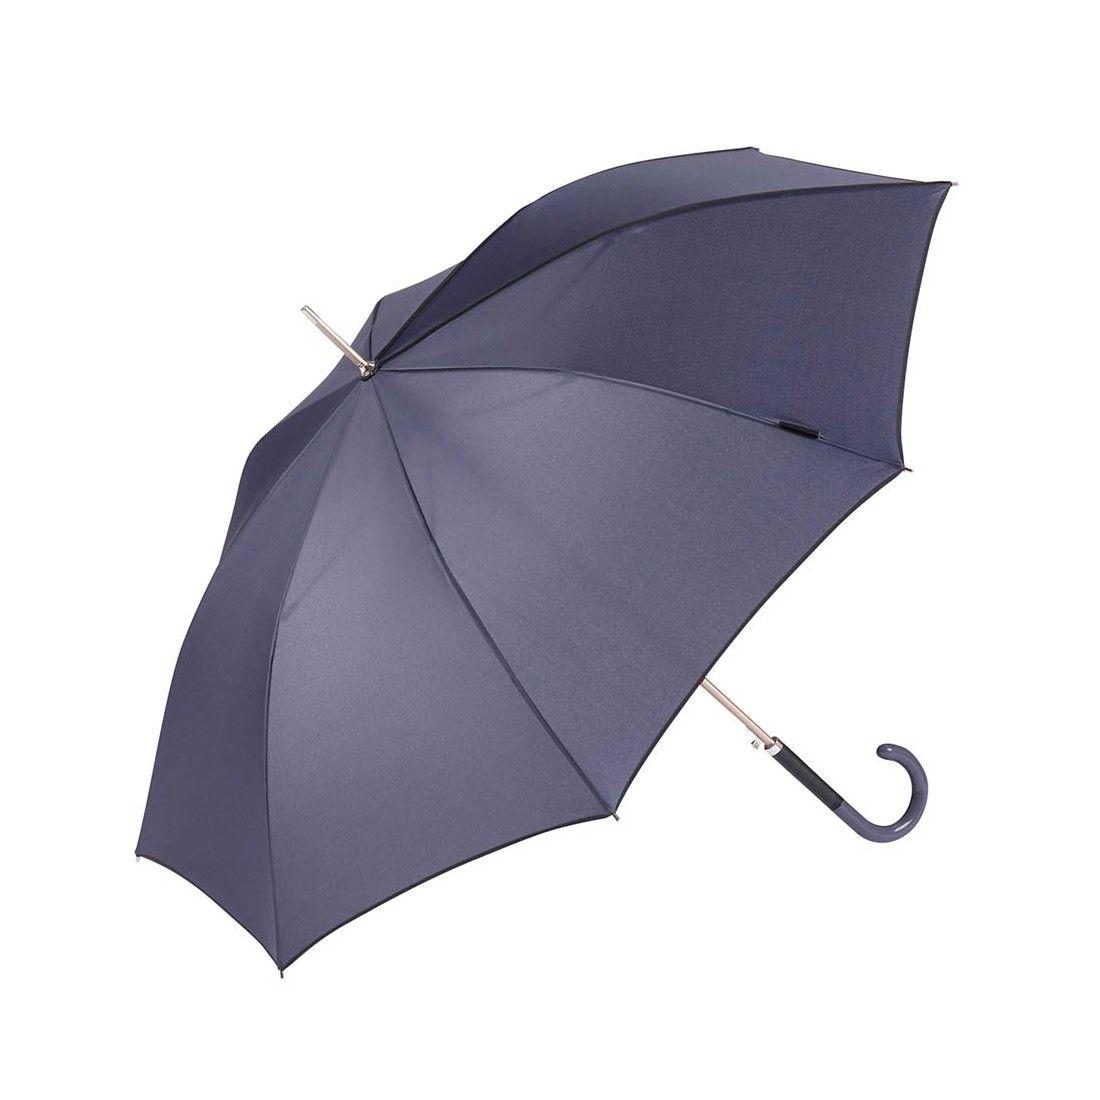 Paraguas 10713 Ezpeleta